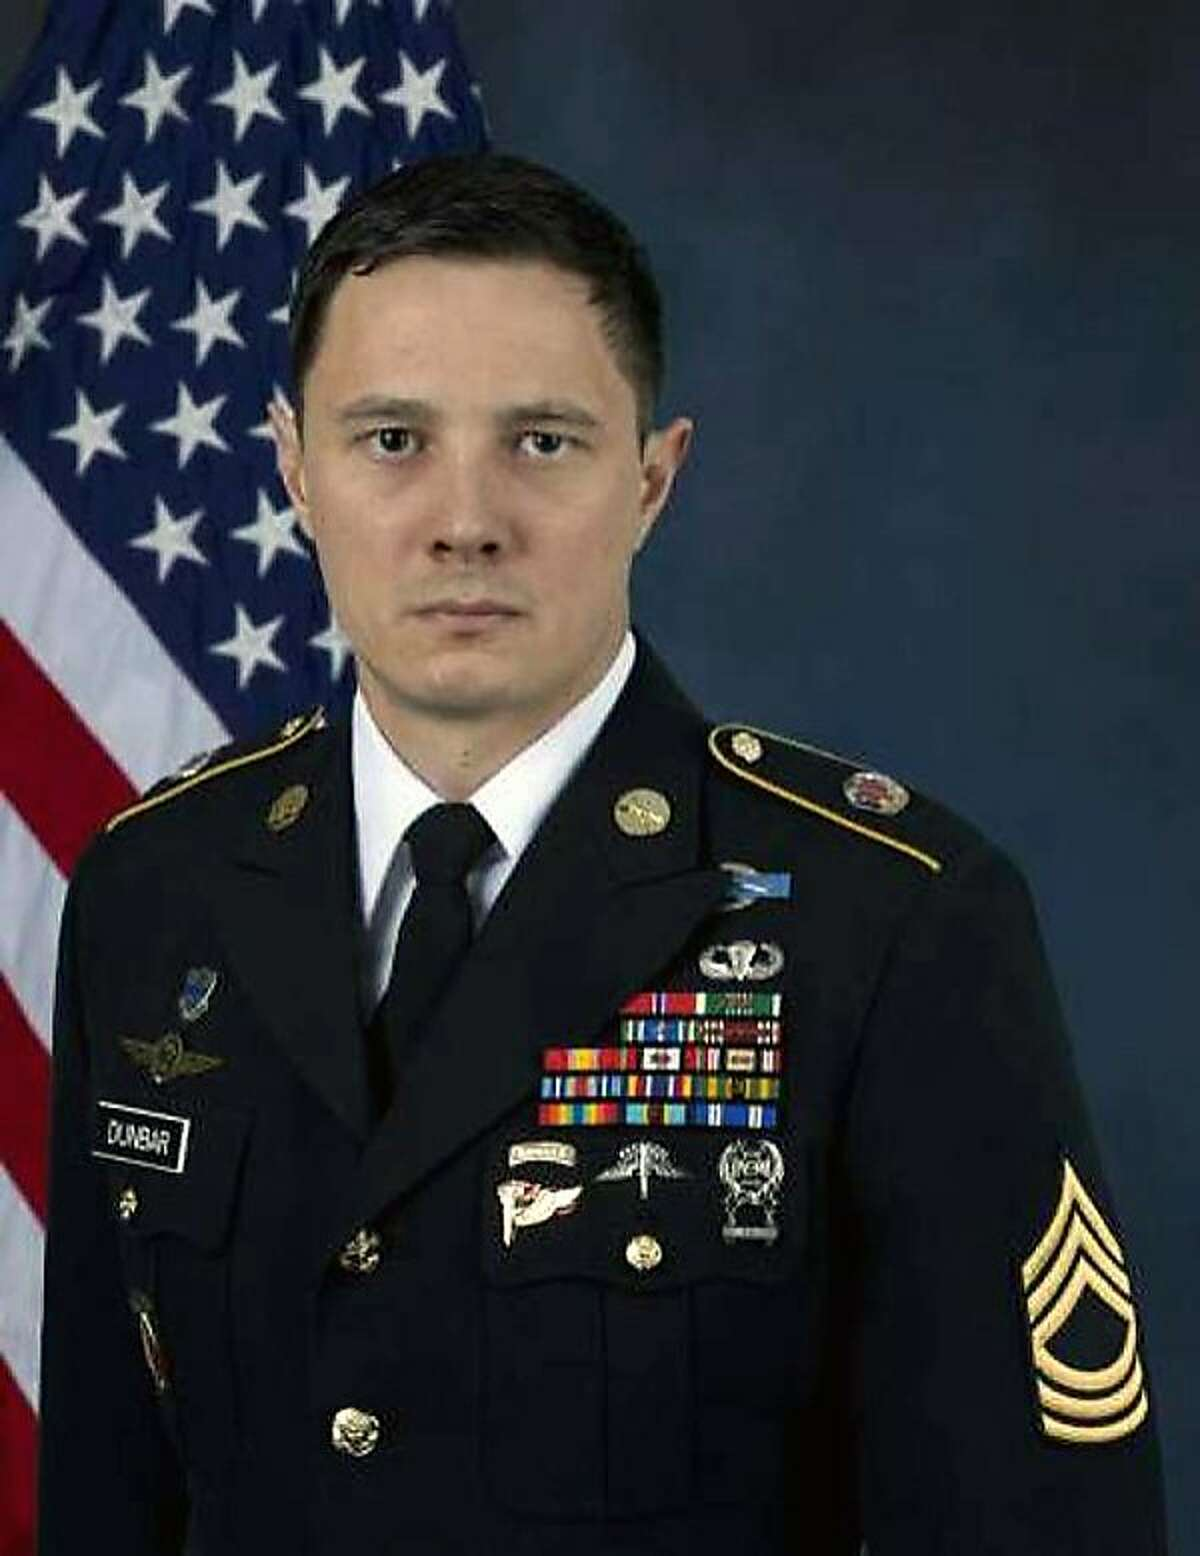 Jonathan J. Dunbar Austin Army Master Sergeant Died: 4/30/2018 Syria